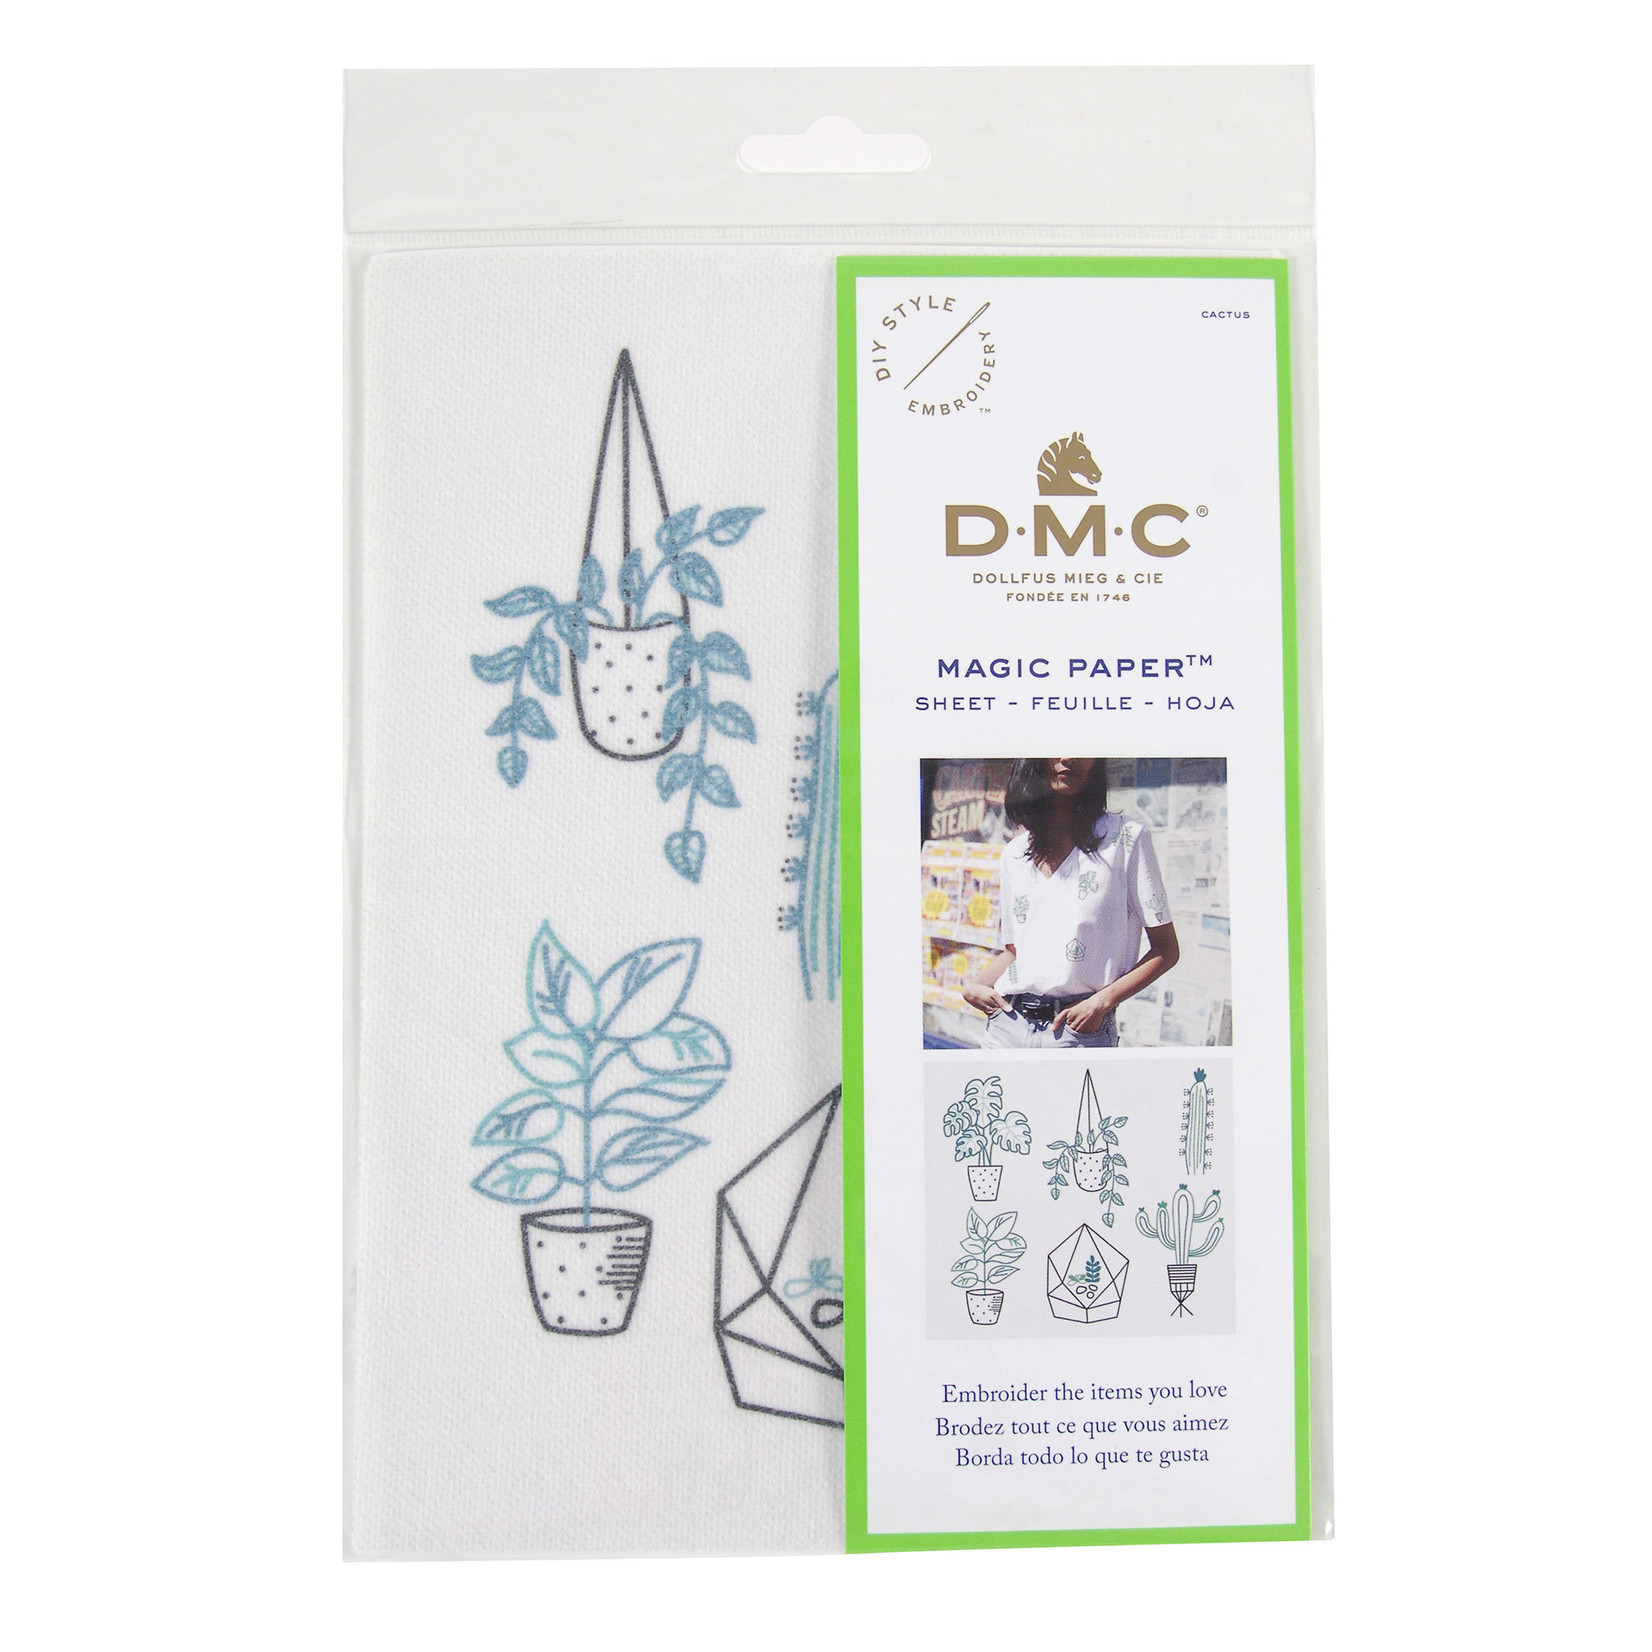 DMC Embroidery Magic Paper